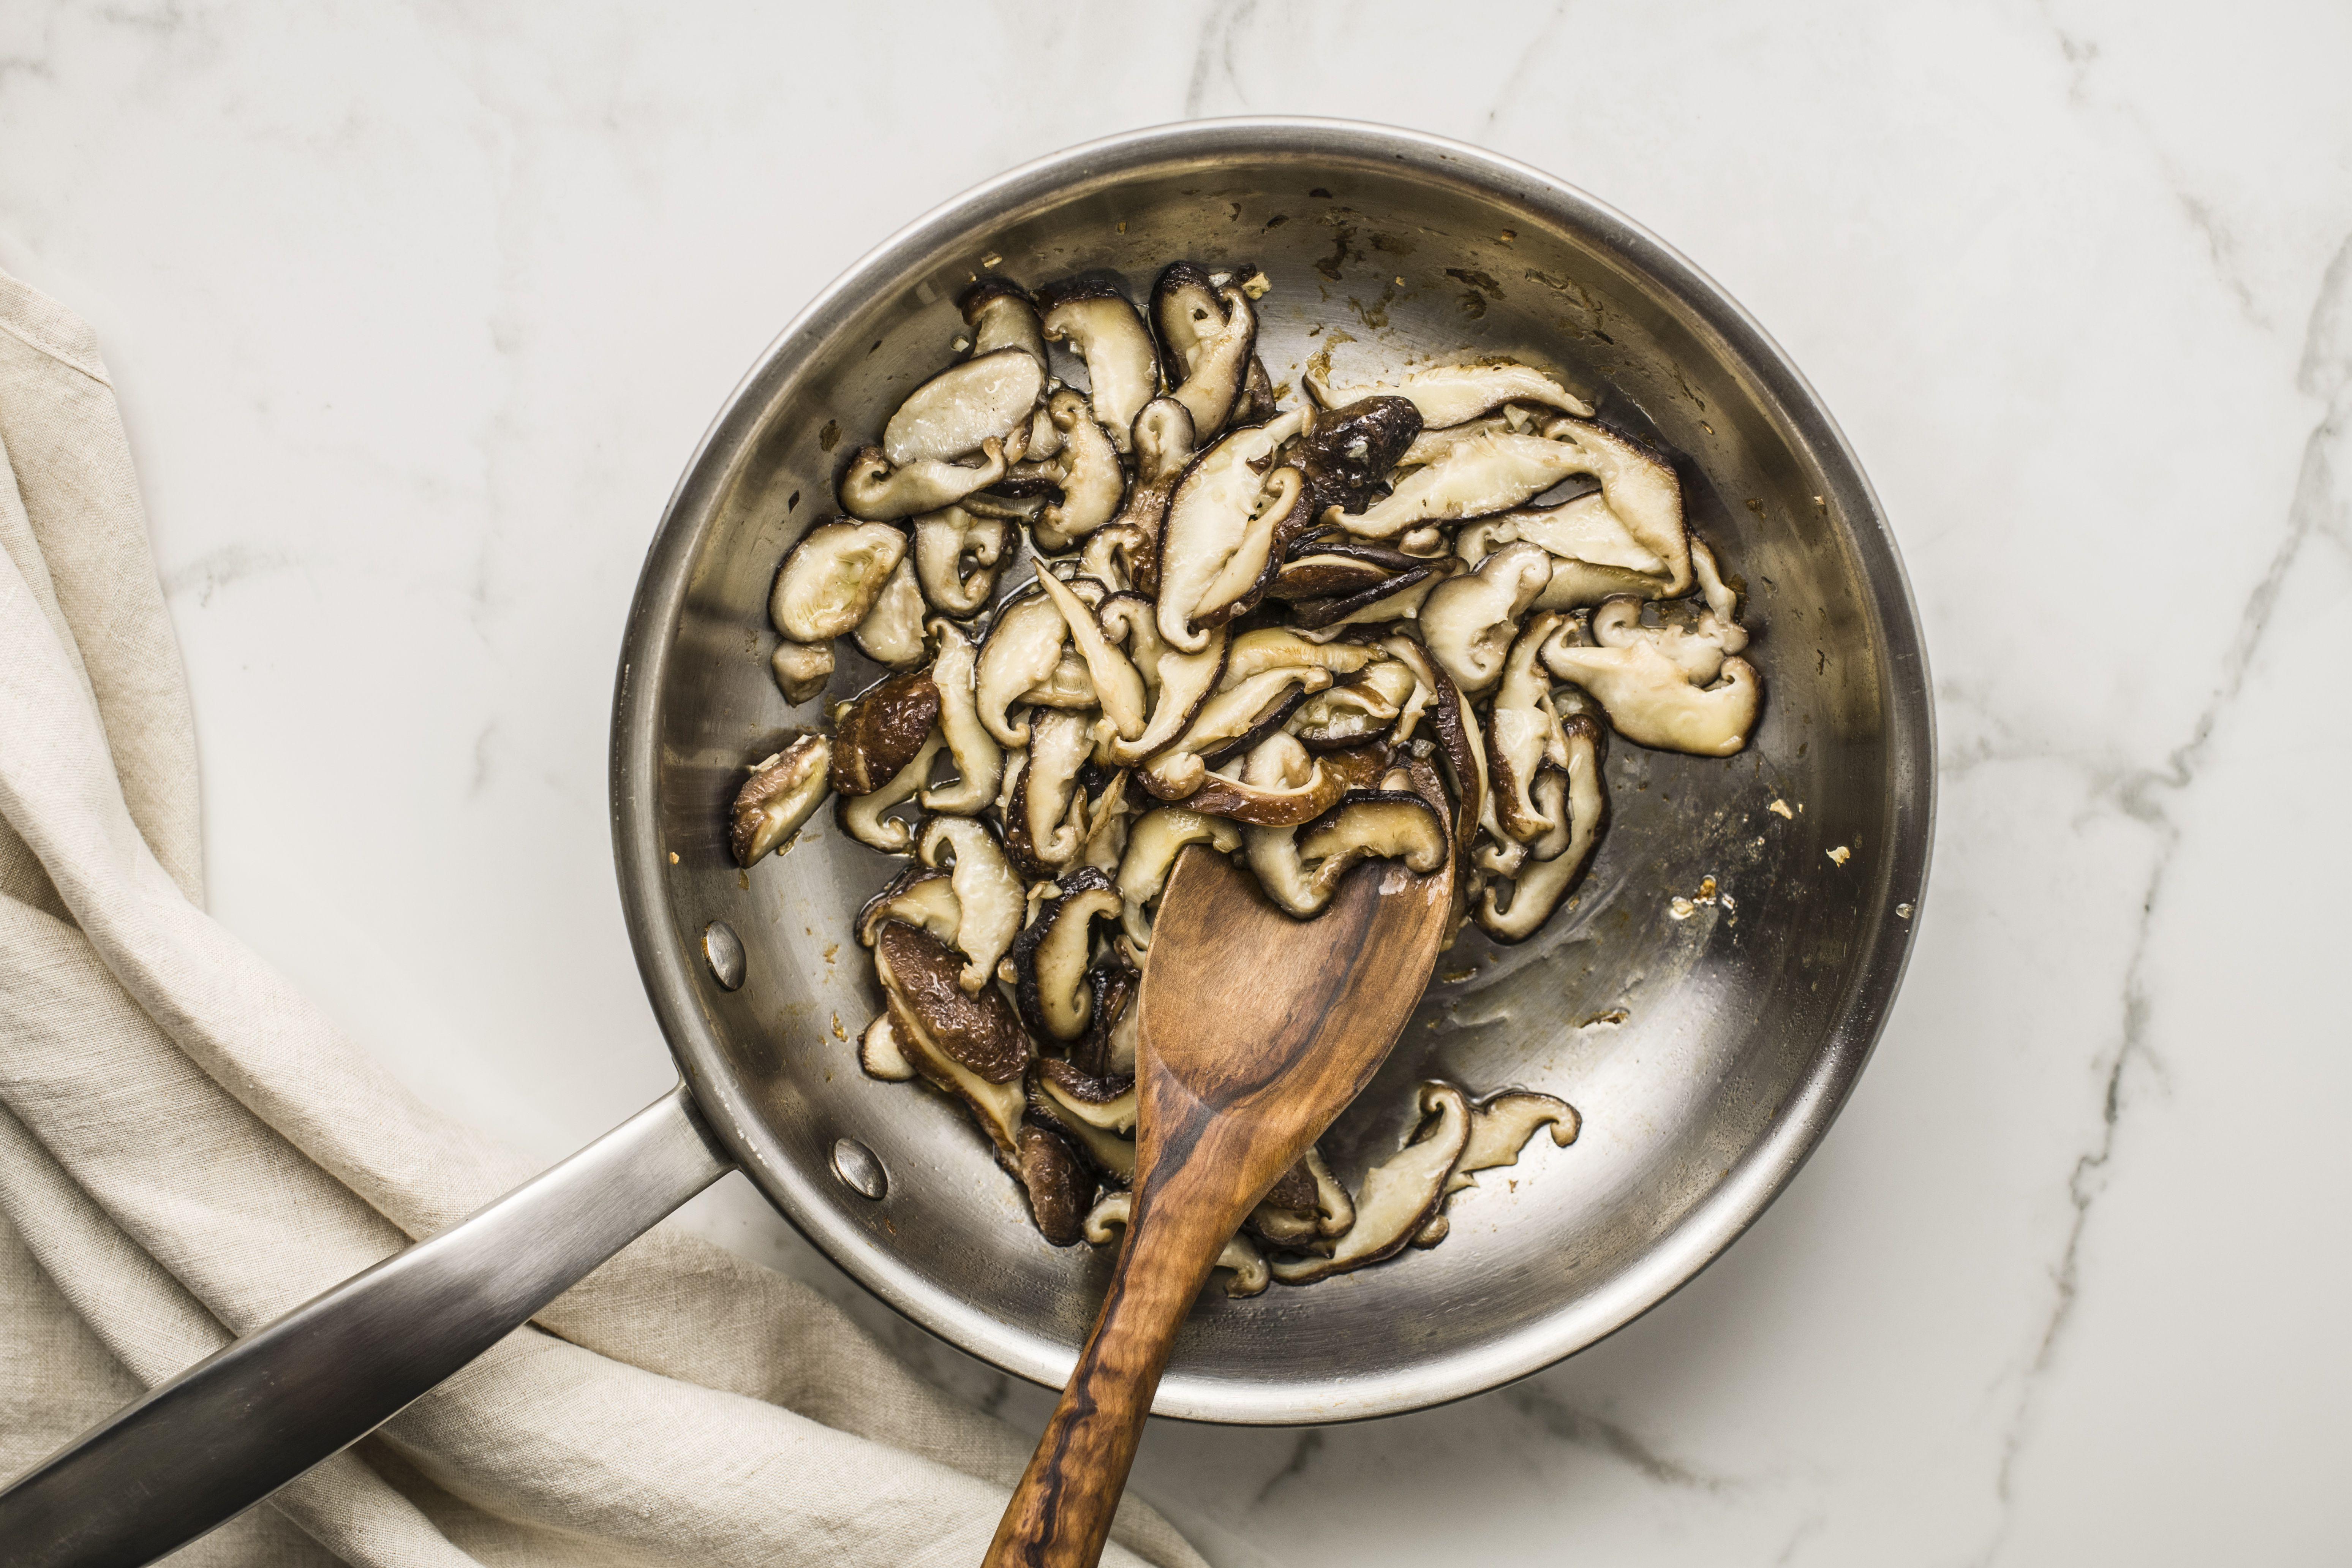 Melt butter and mushrooms